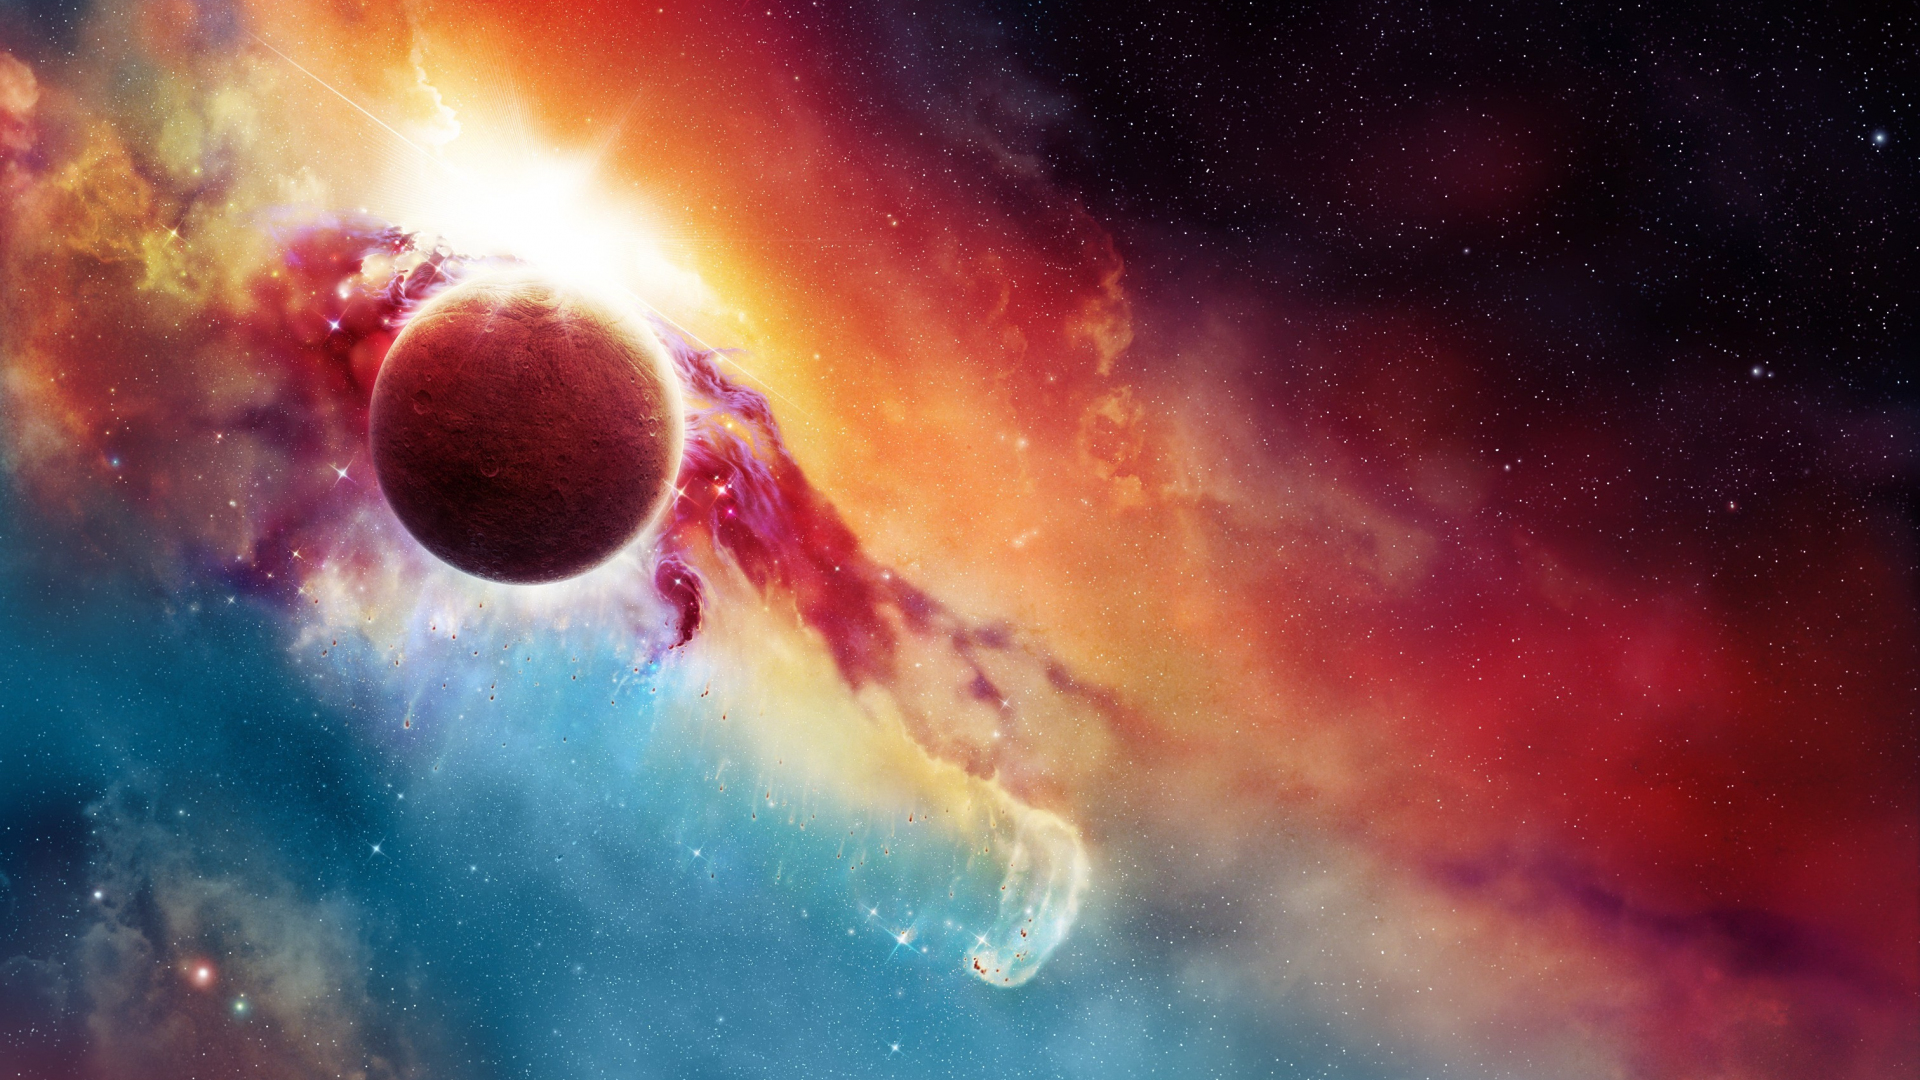 Download 1920x1080 Wallpaper Fantasy Space Planet Wallpaper Full Hd